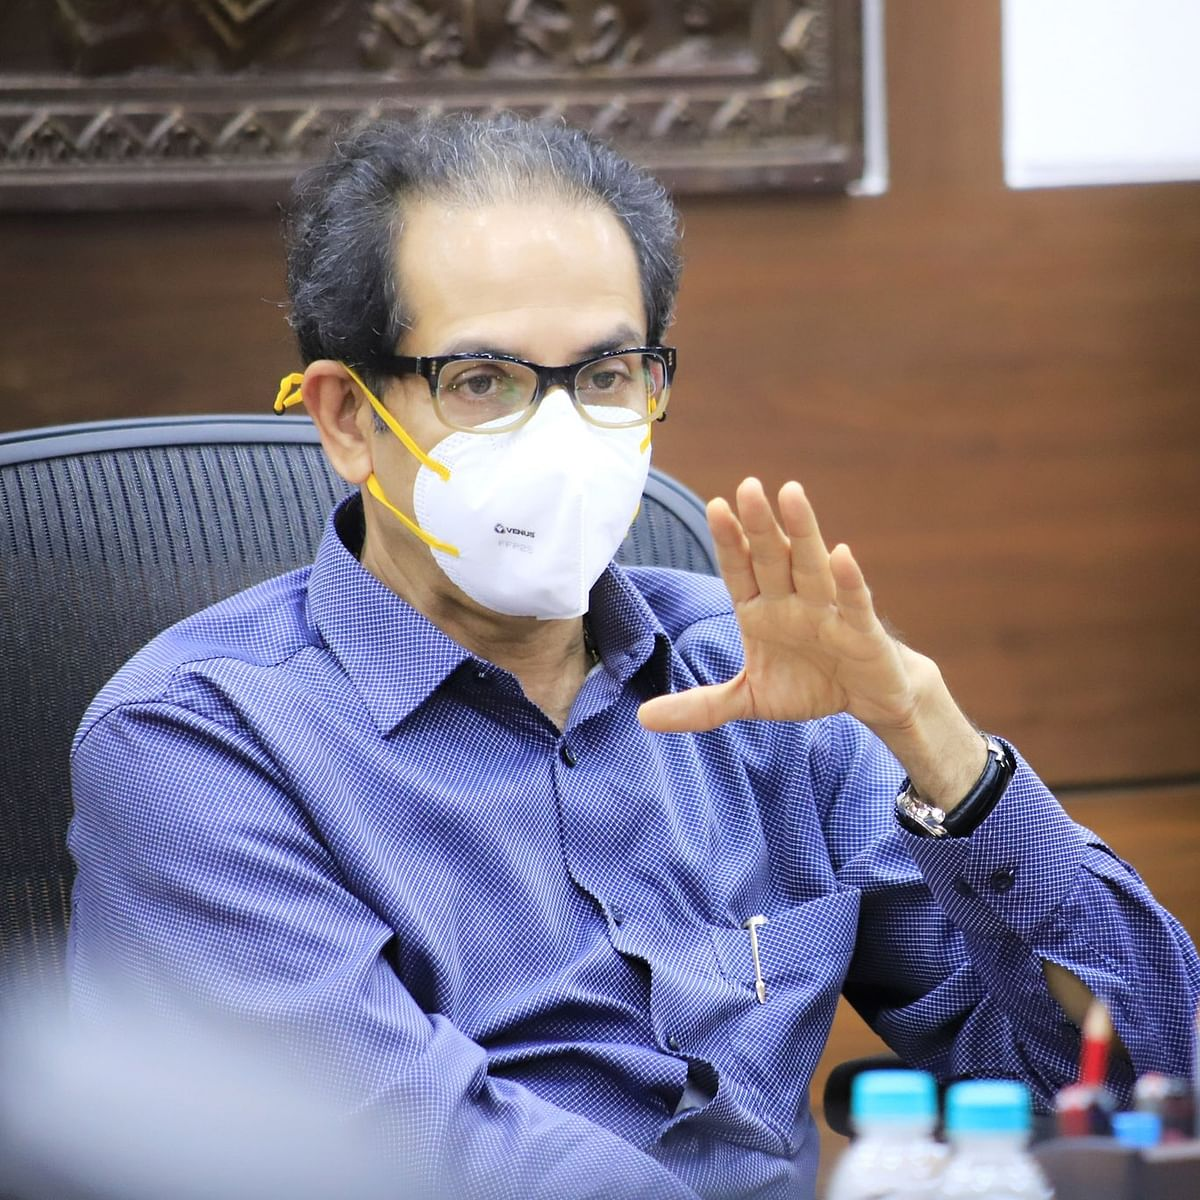 Maharashtra govt set to administer 15 lakh vaccine doses daily, says CM Uddhav Thackeray